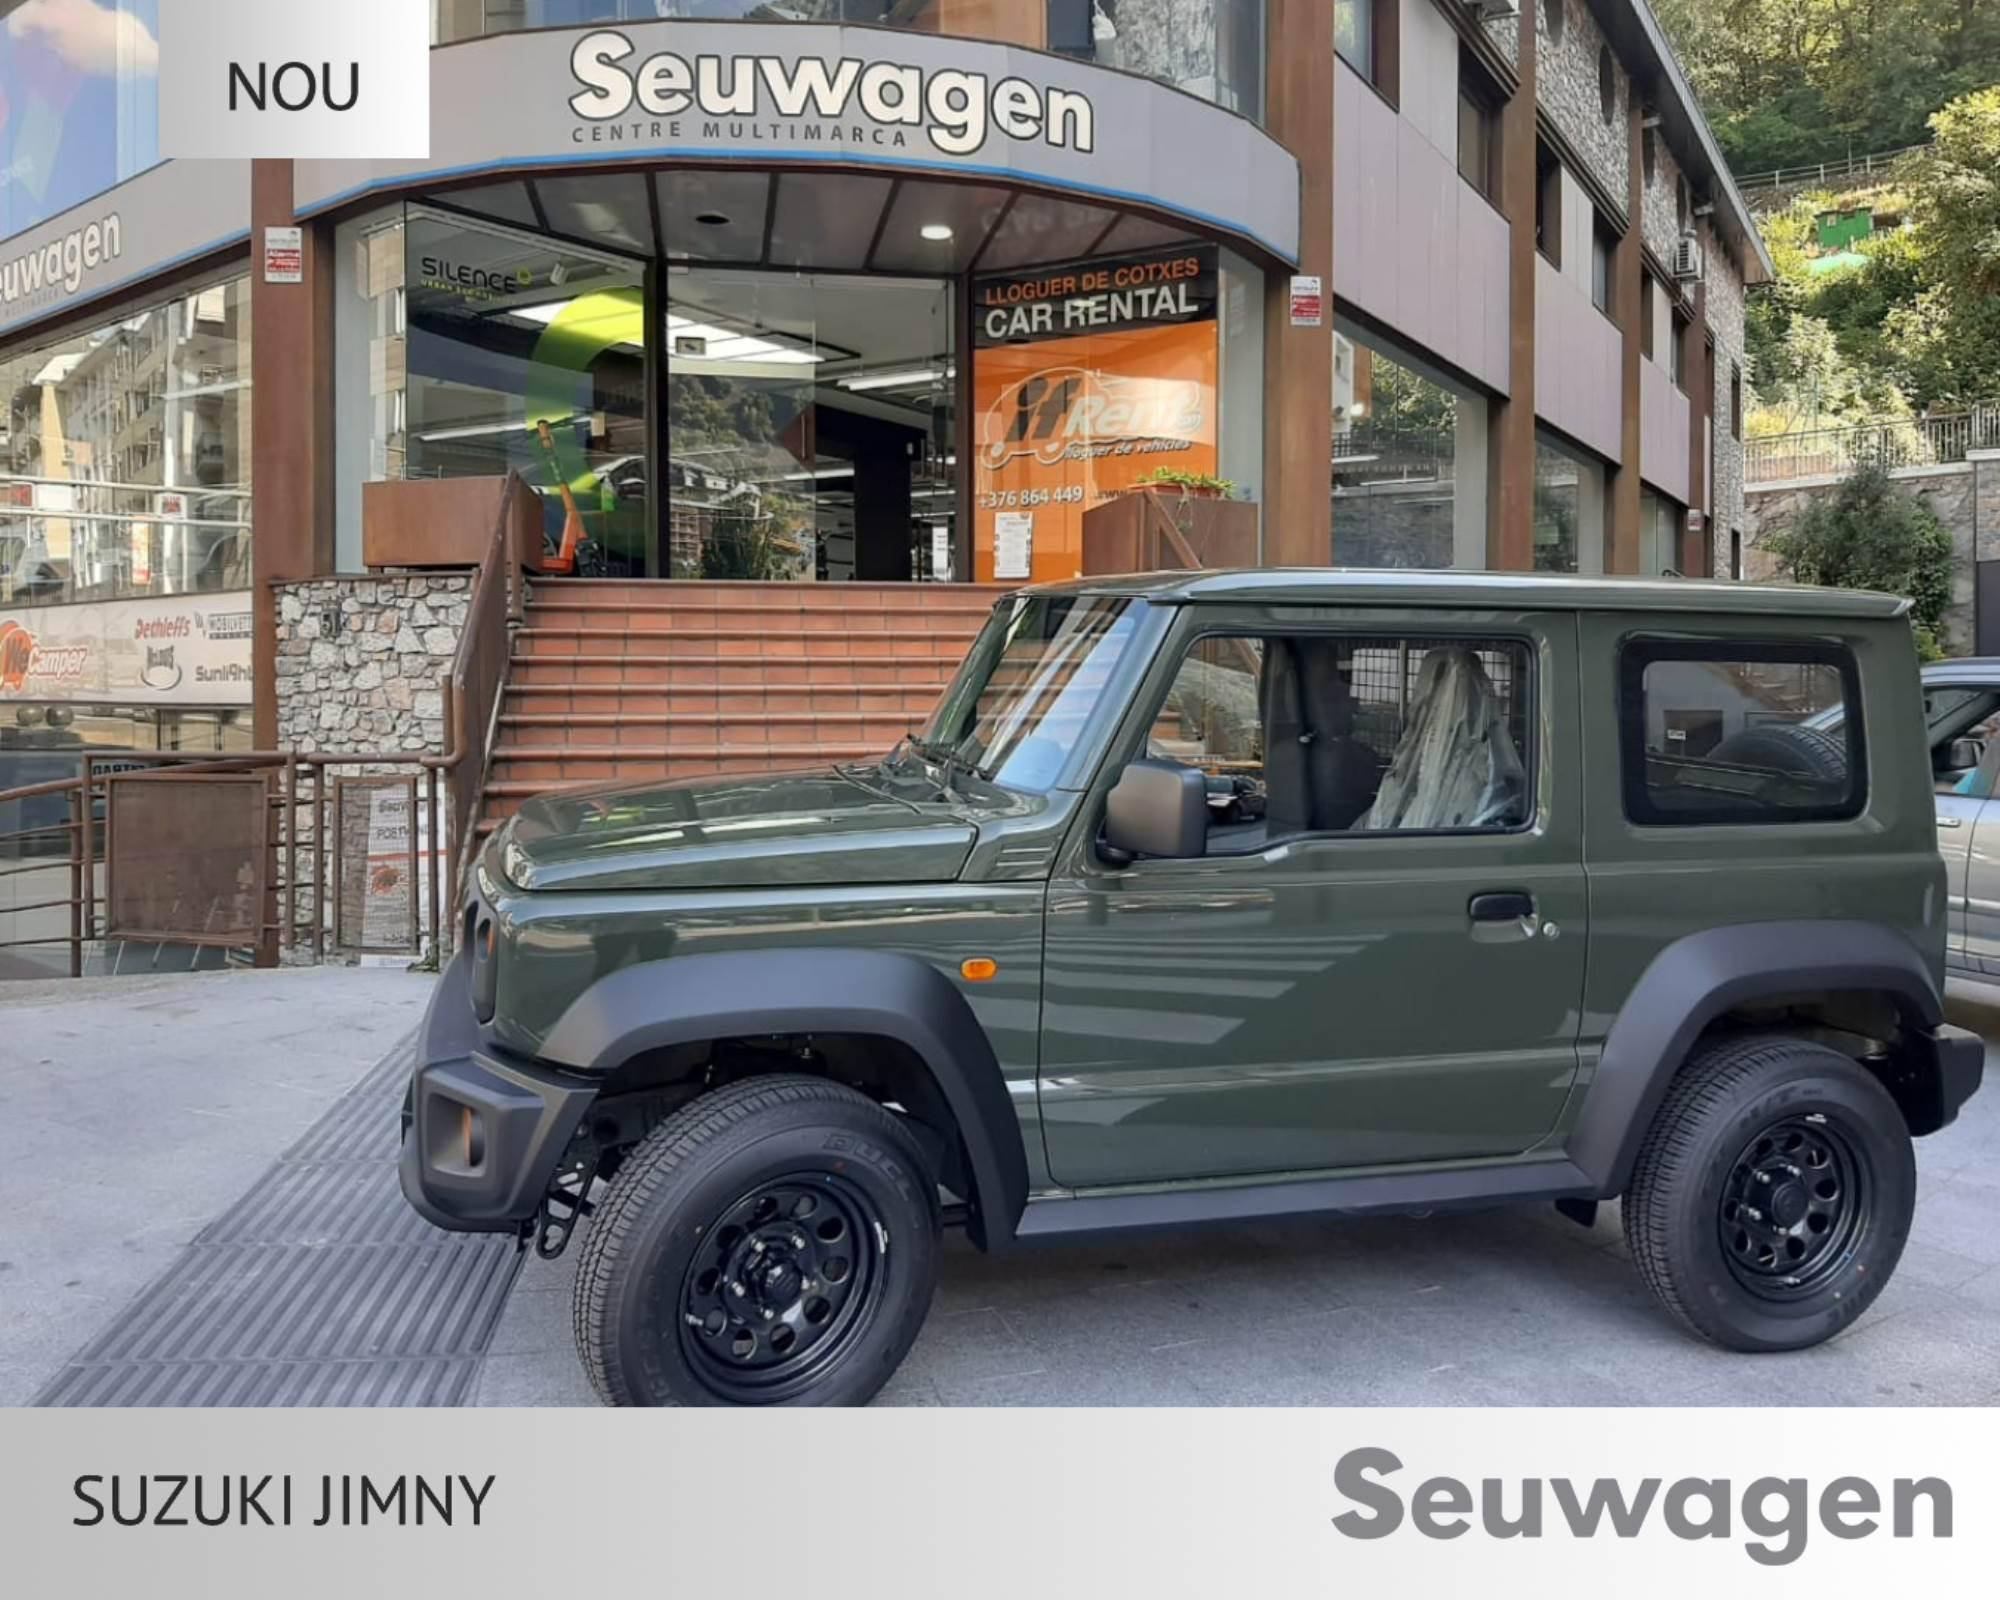 Suzuki - Jimny - Mode3 Mode3 Benzina  2021  00 Km